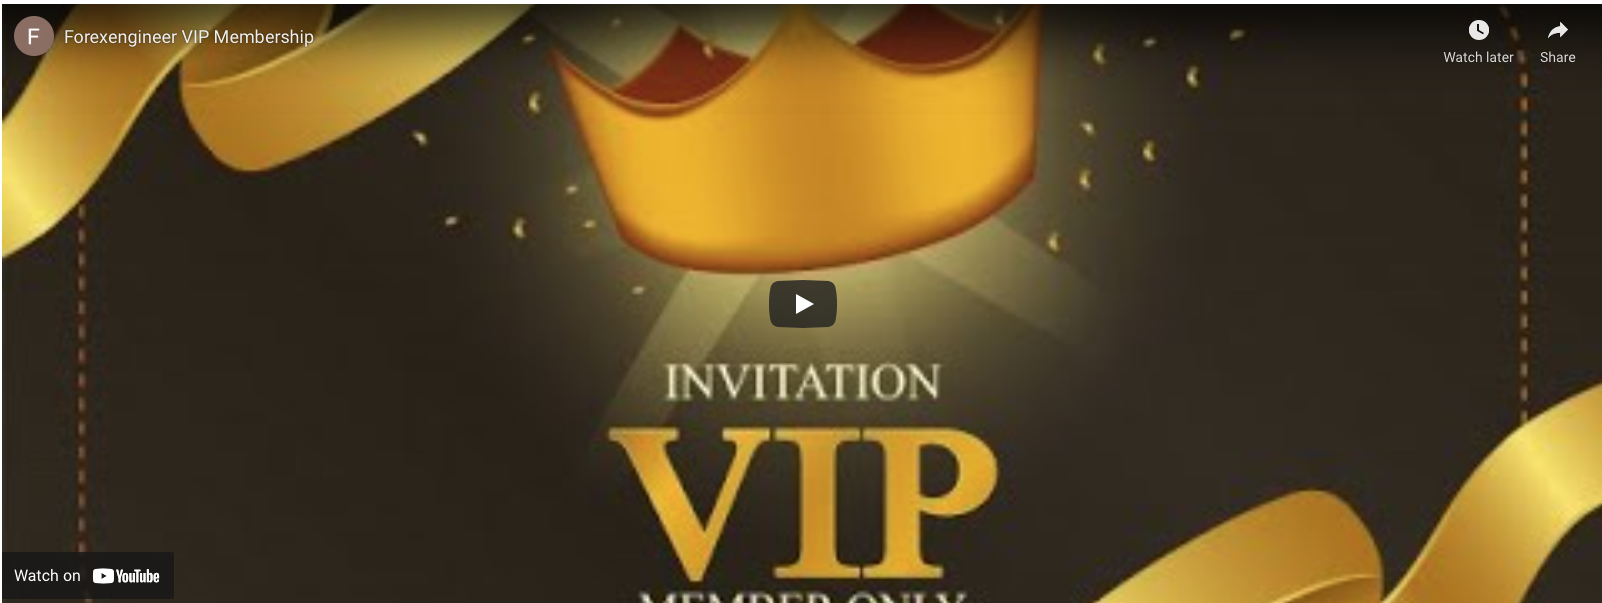 VIP introduction